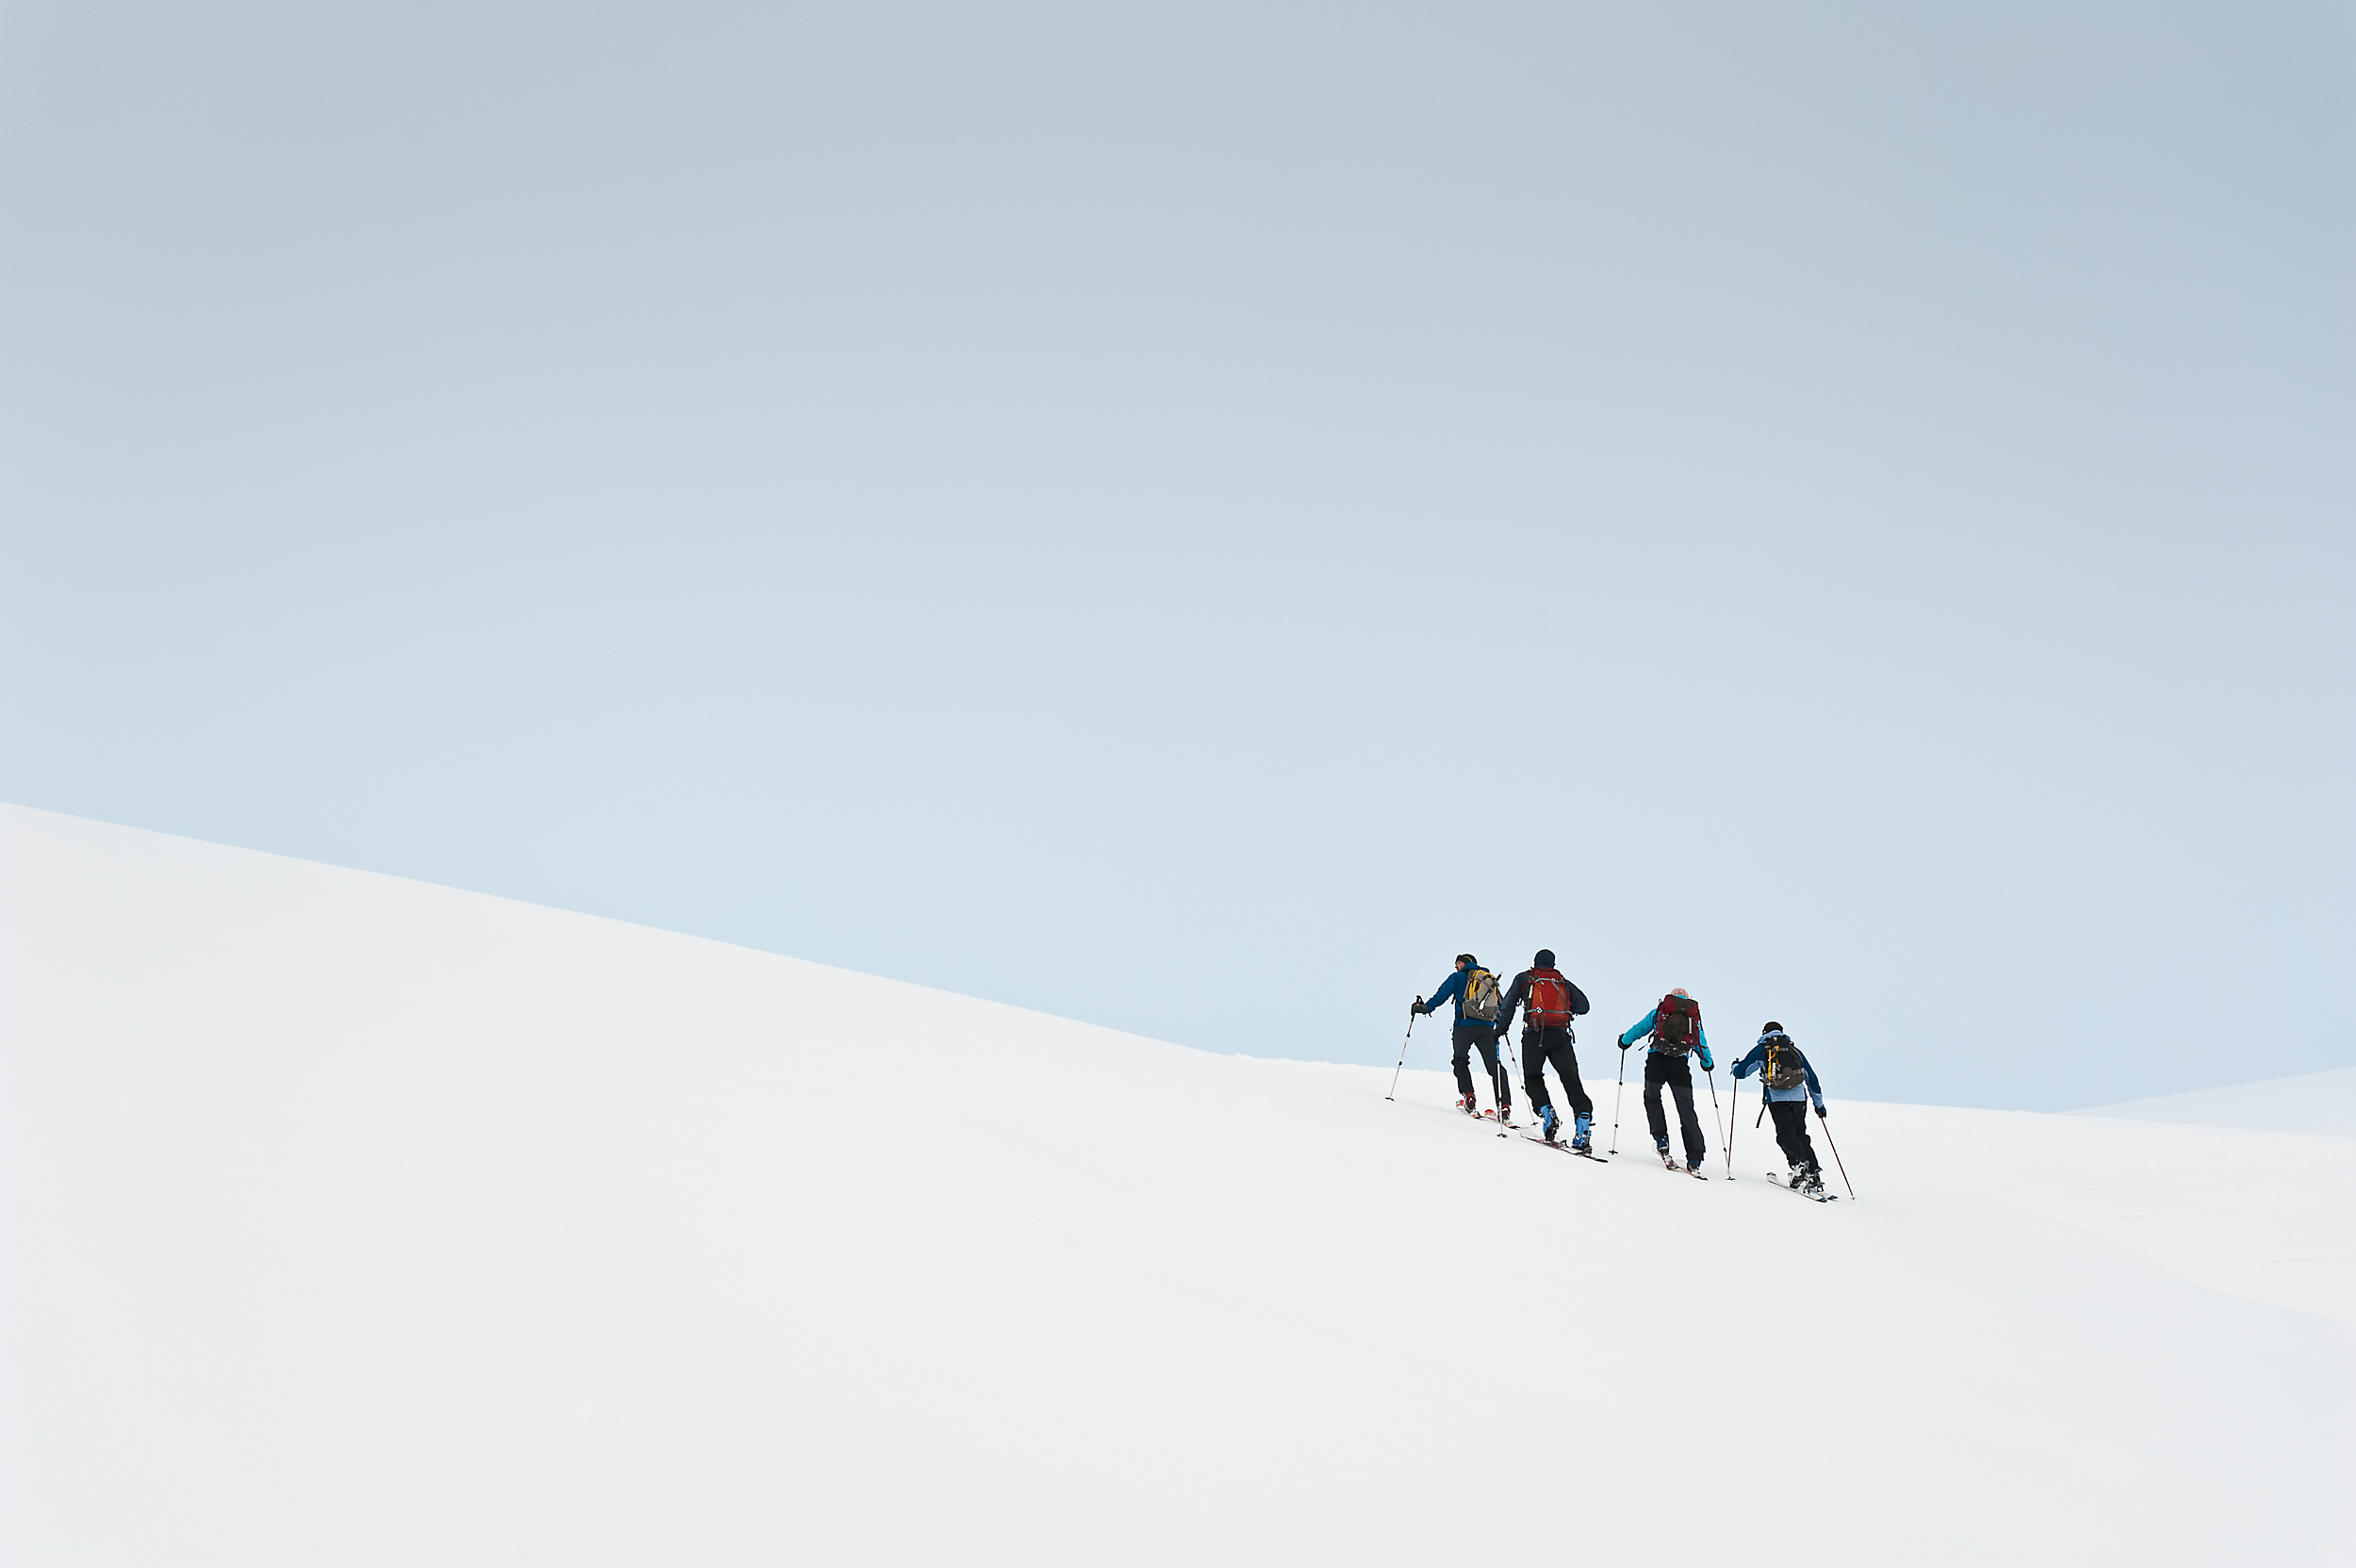 Ski touring - Scotland